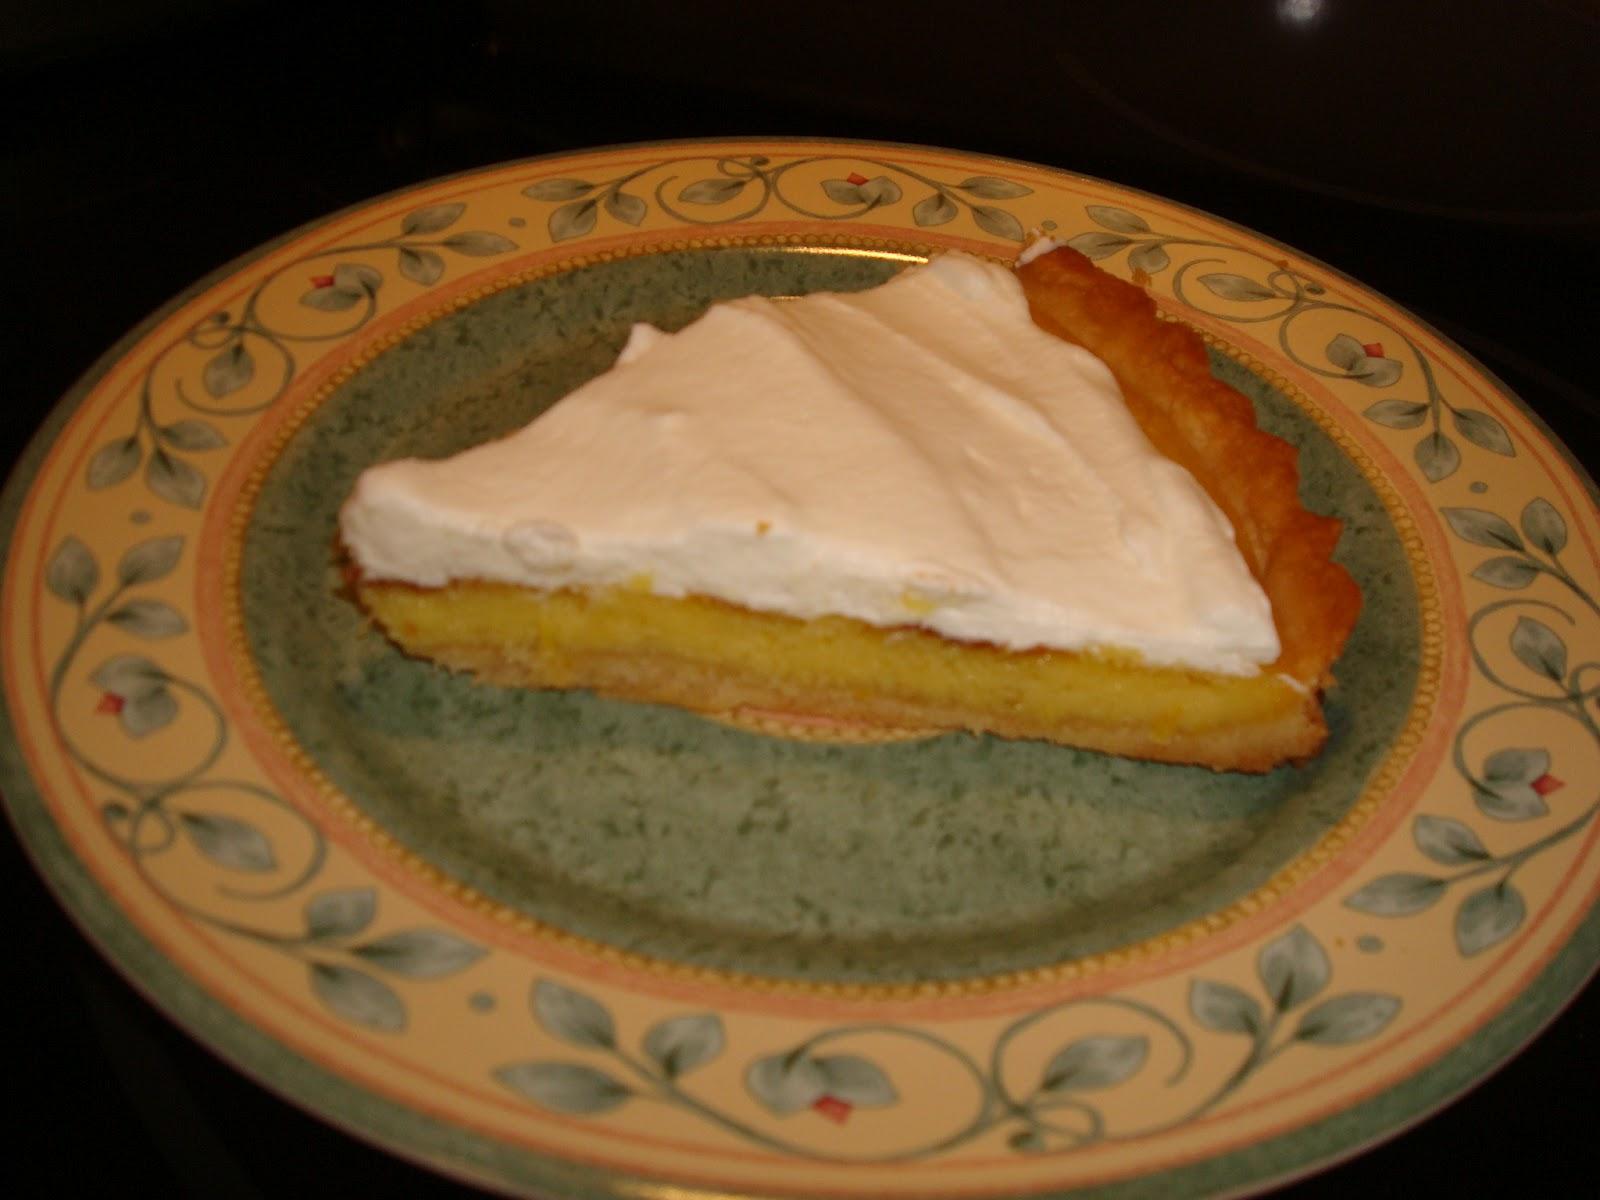 mocha me: Rustic Meyer Lemon Tart